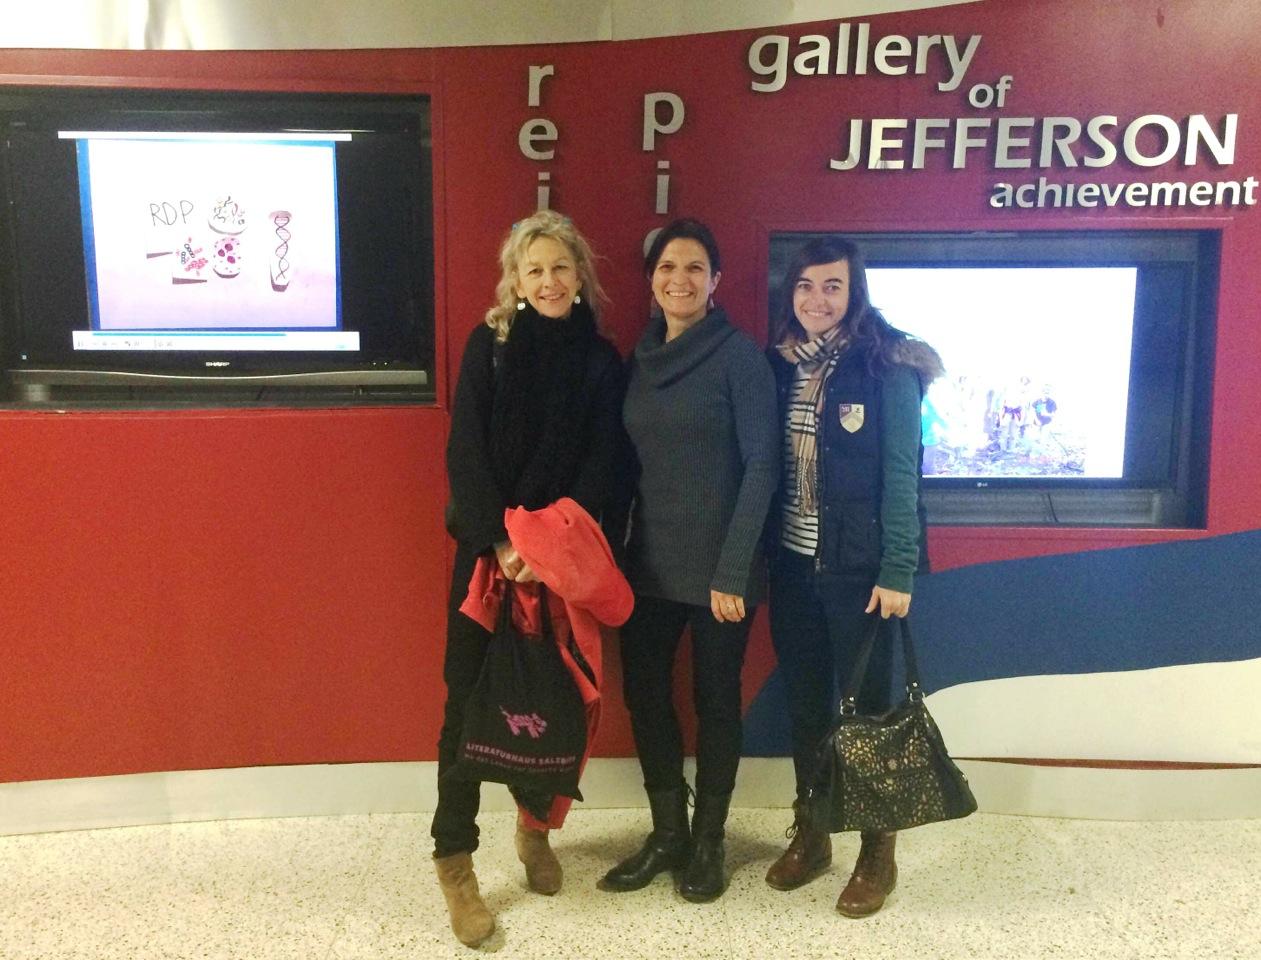 Jefferson HS - Goethe Institut Washington